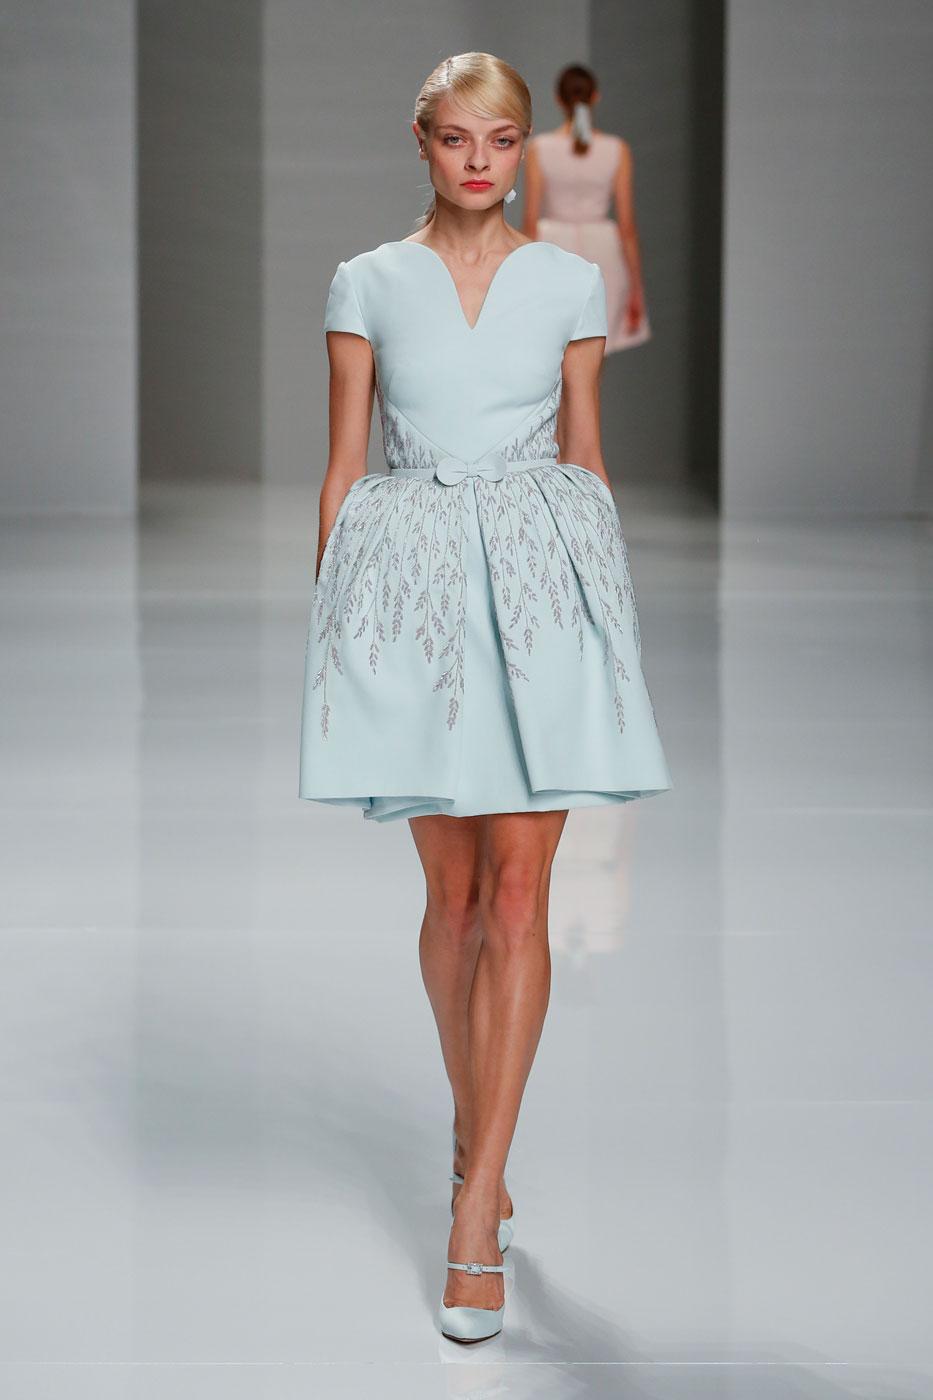 Georges-Hobeika-fashion-runway-show-haute-couture-paris-spring-2015-the-impression-03